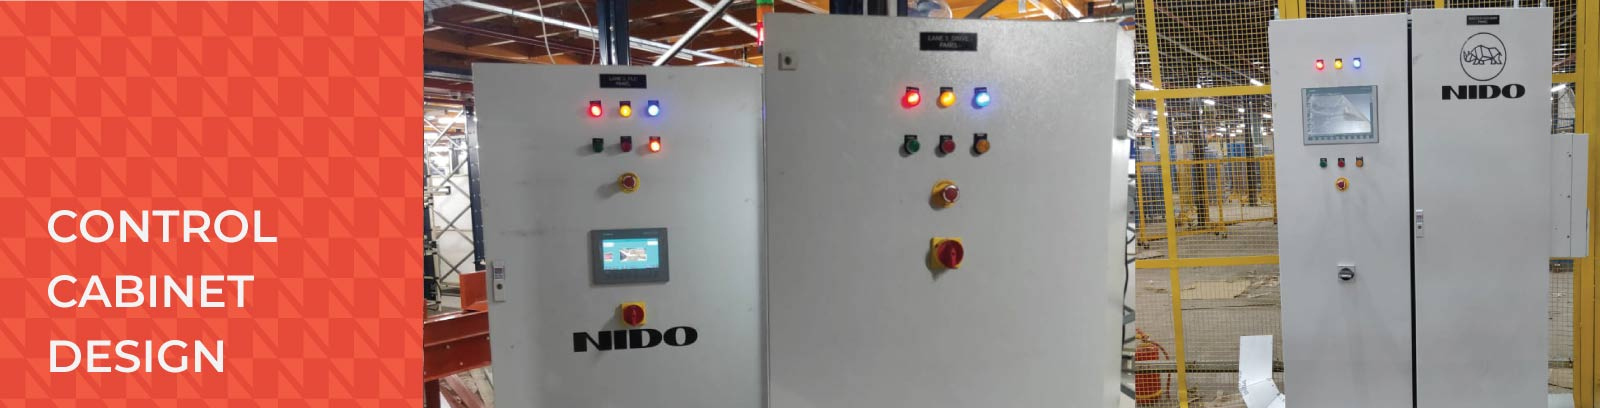 Control cabinet design